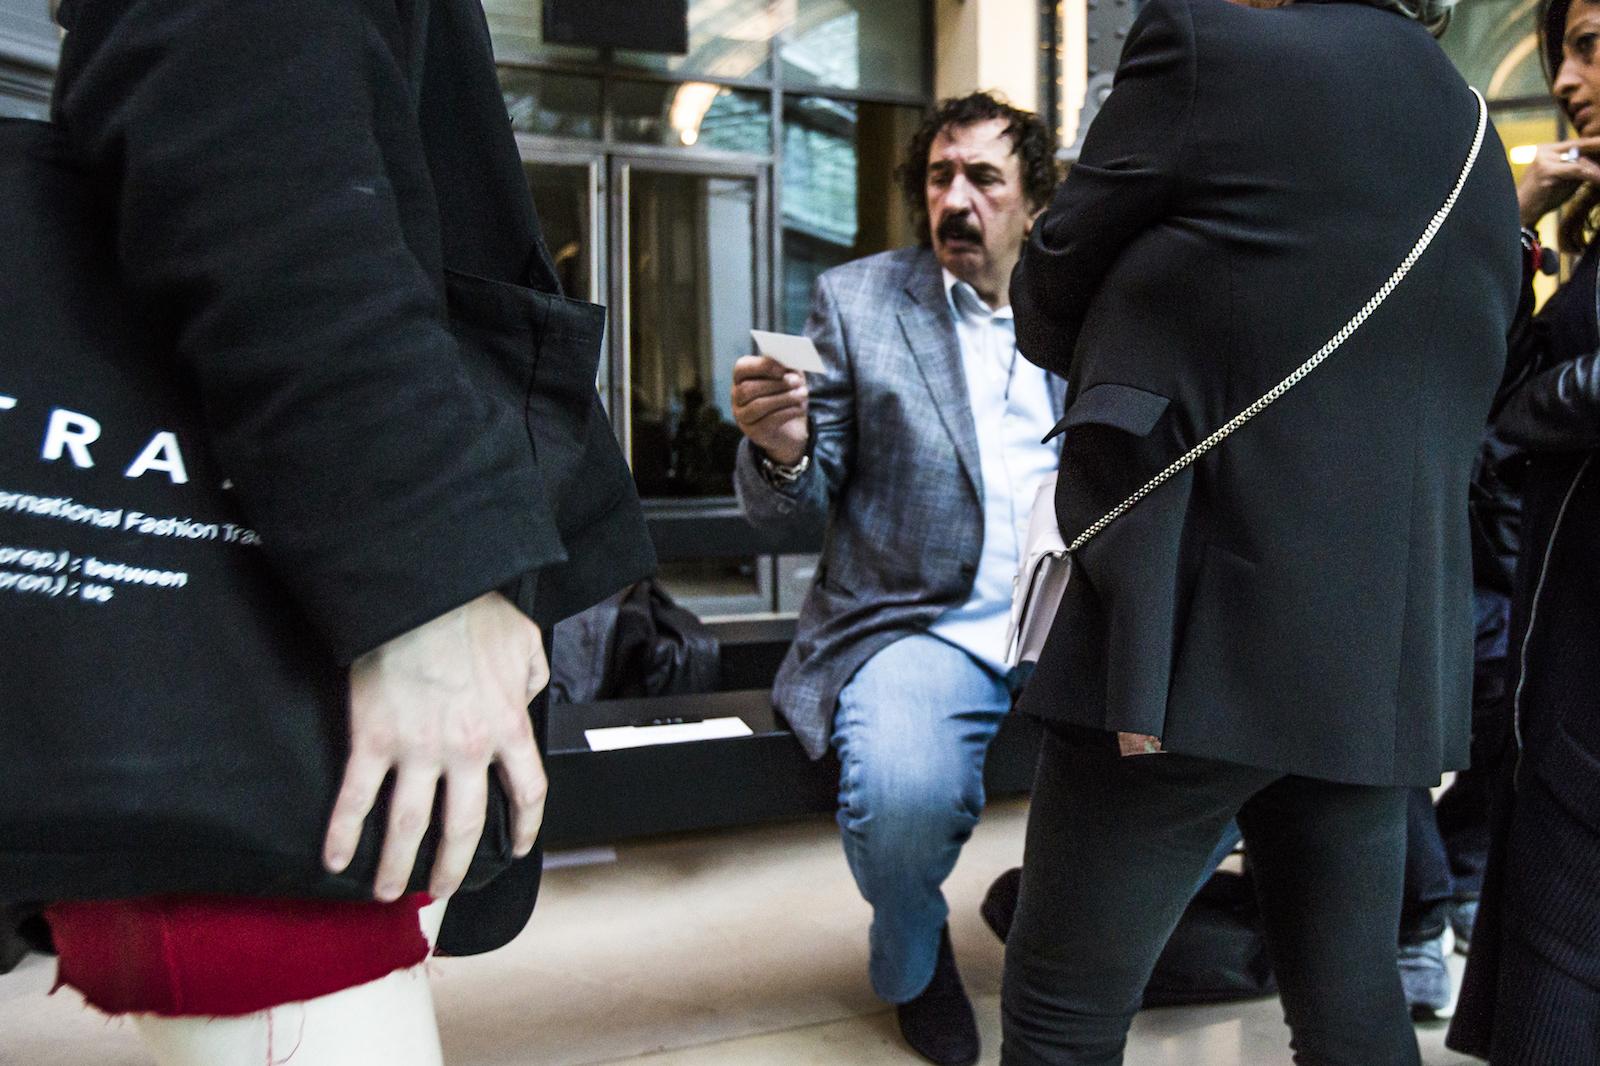 miljonär dating show Bravo plats dejtingsajt bedragare